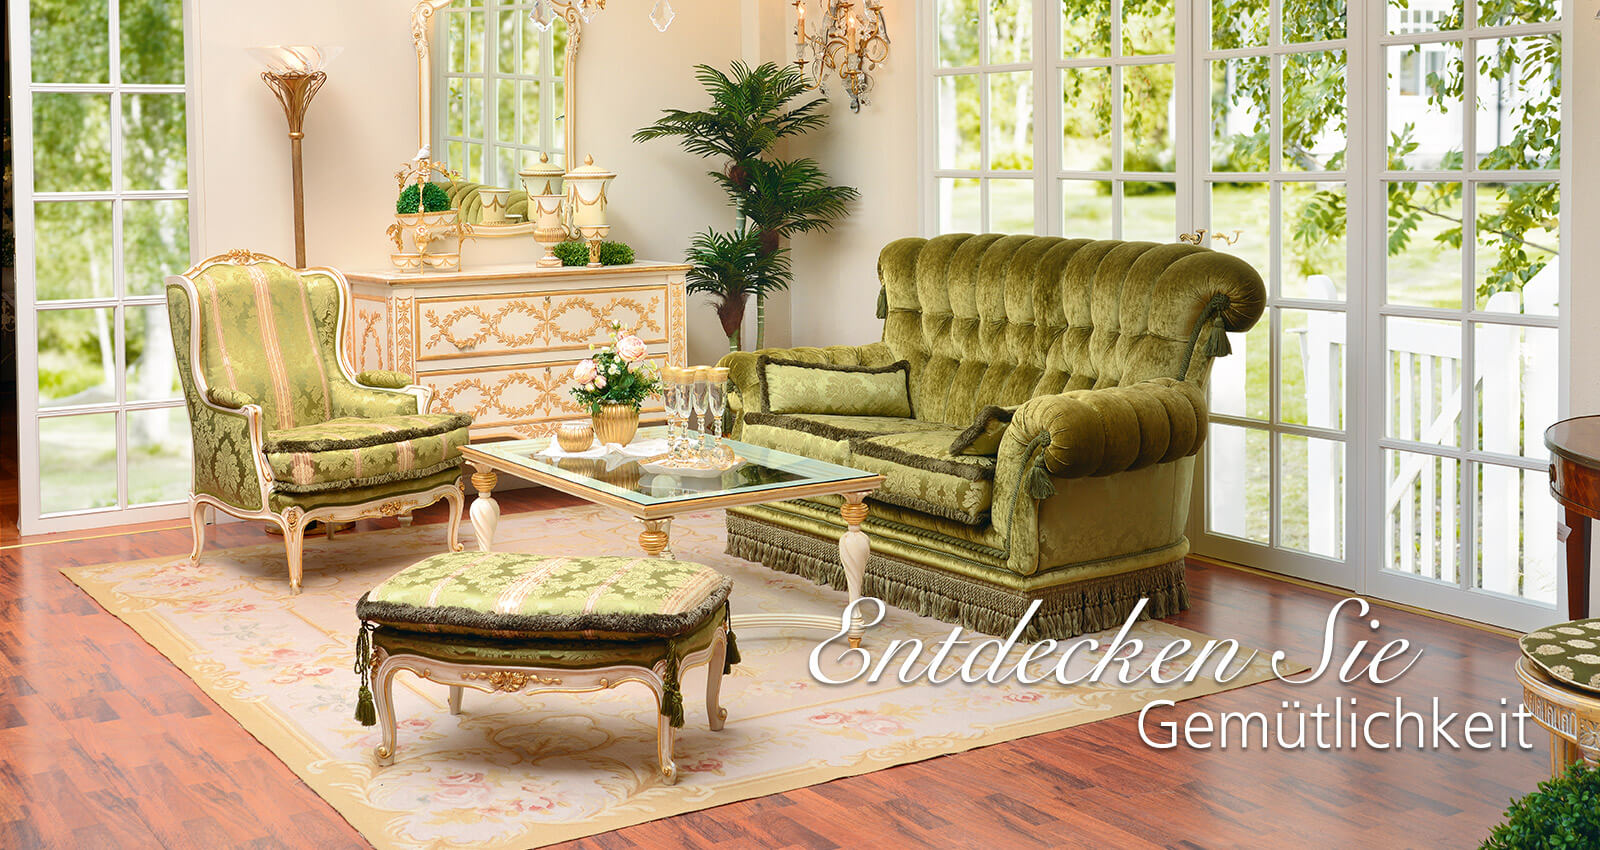 rundgang-40-gruenes-sofa